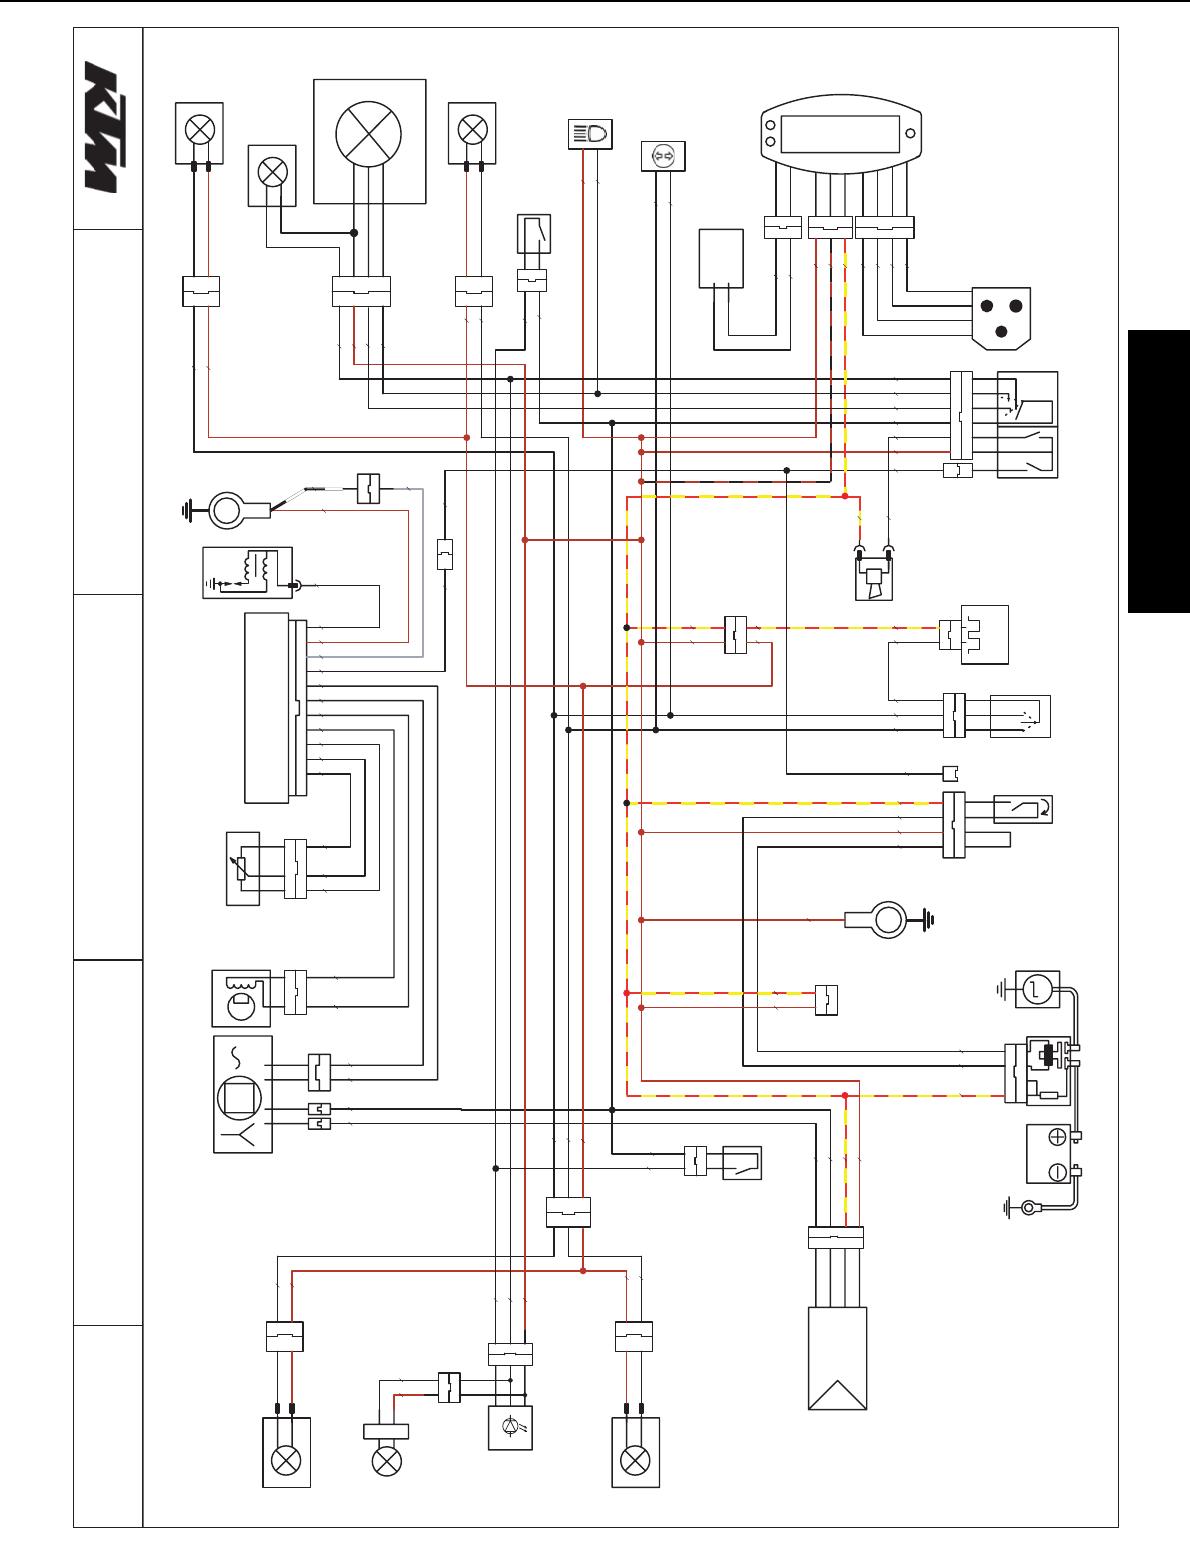 Ktm 450 Exc 2018 Wiring Diagram